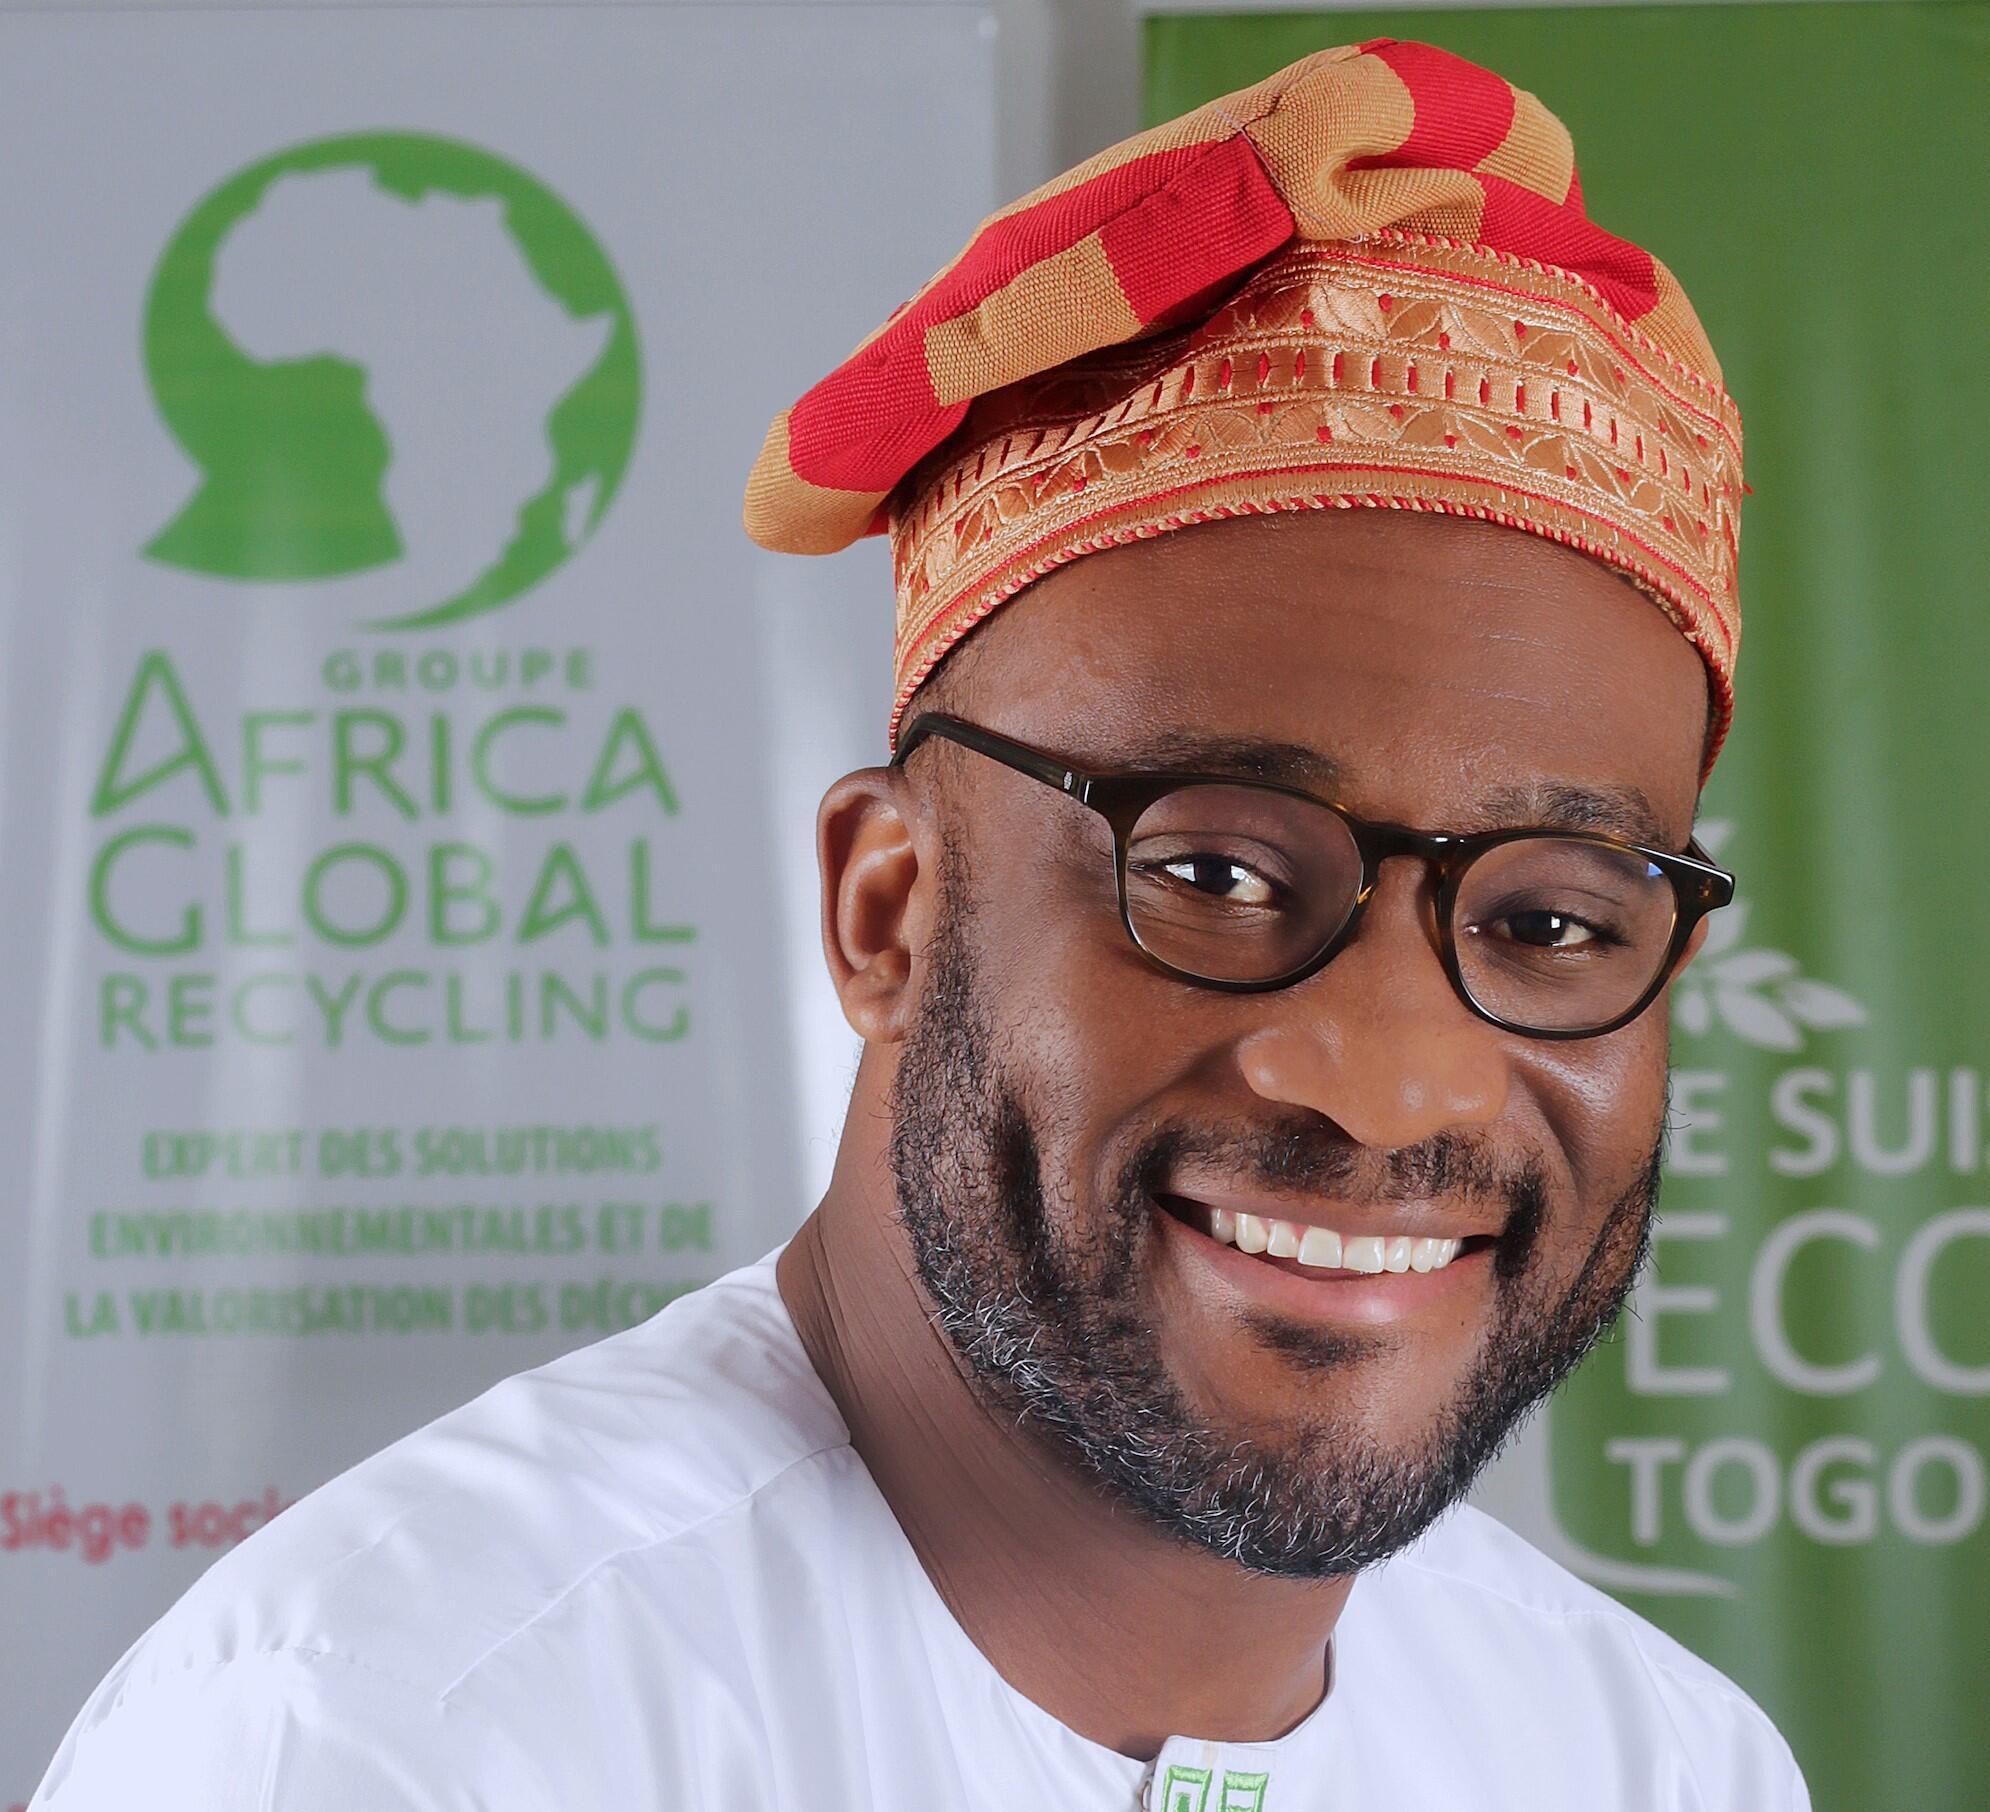 Edem d'Almeida, fondateur d'Africa Global Recycling.